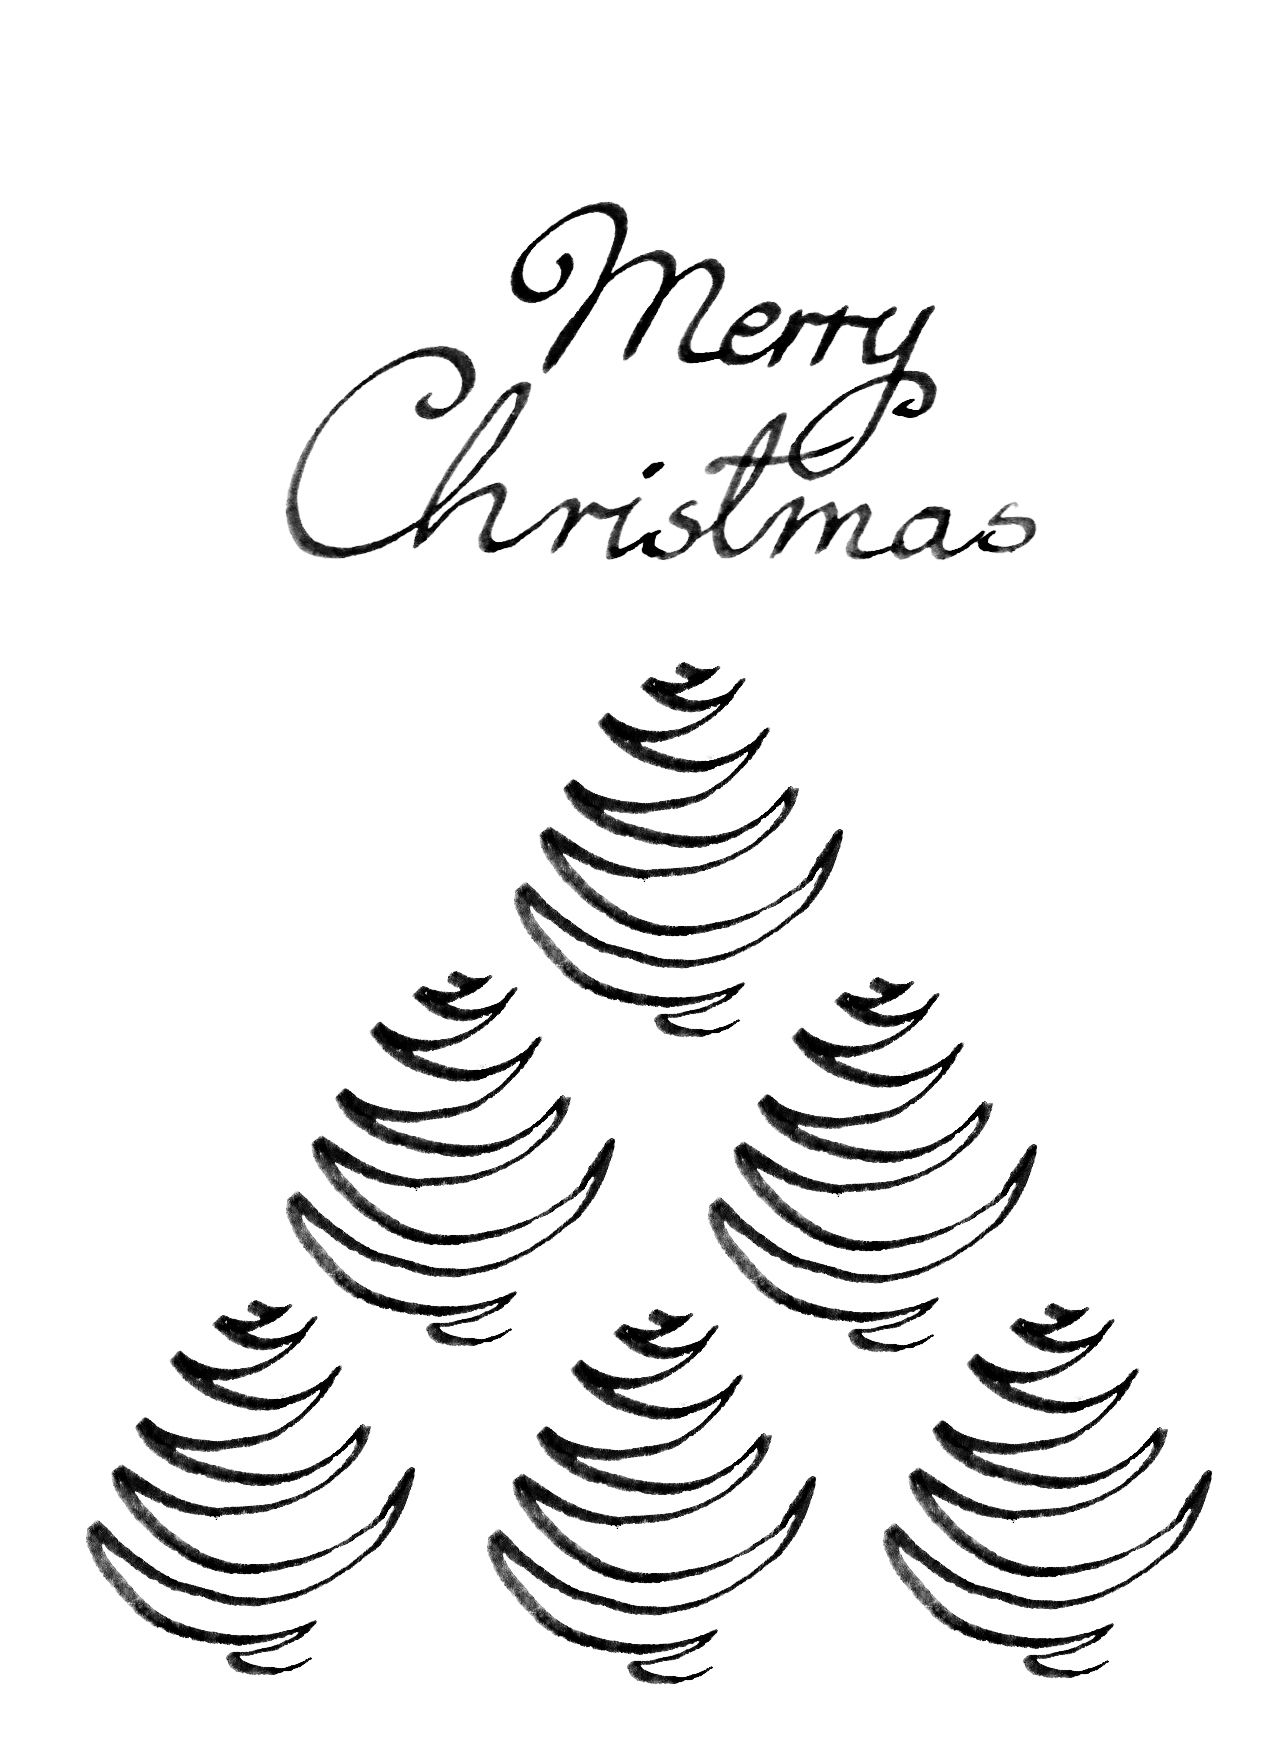 Minimalistic Black And White Christmas Card, Christmas Tree Line Drawing